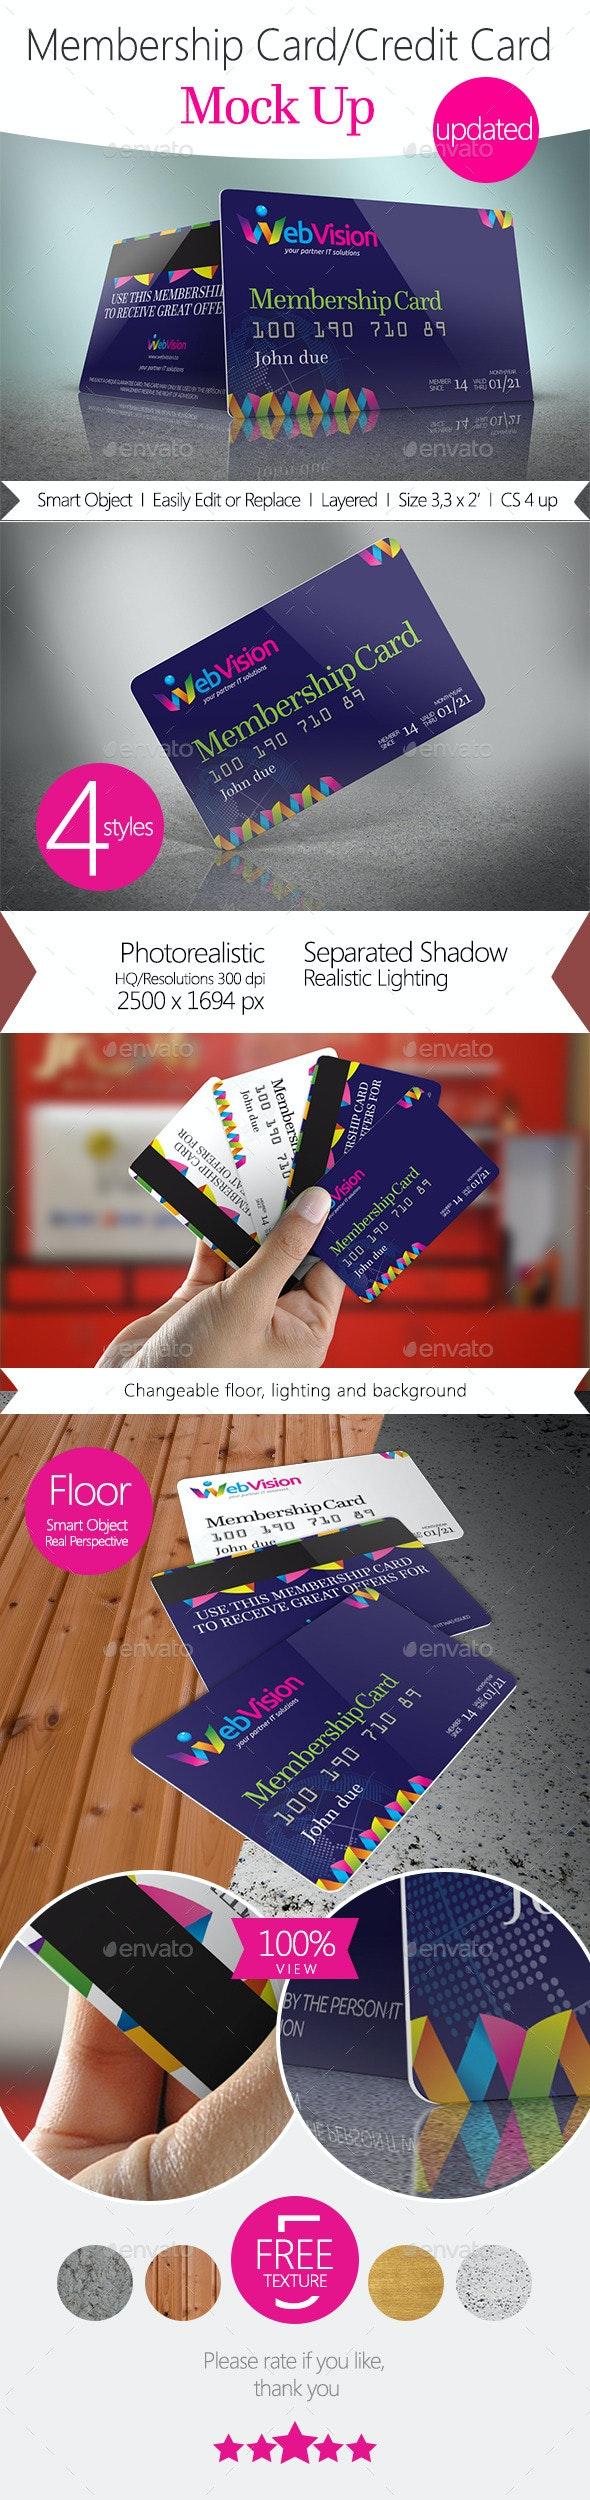 Membership Card/Credit Card Mock Up - Miscellaneous Print